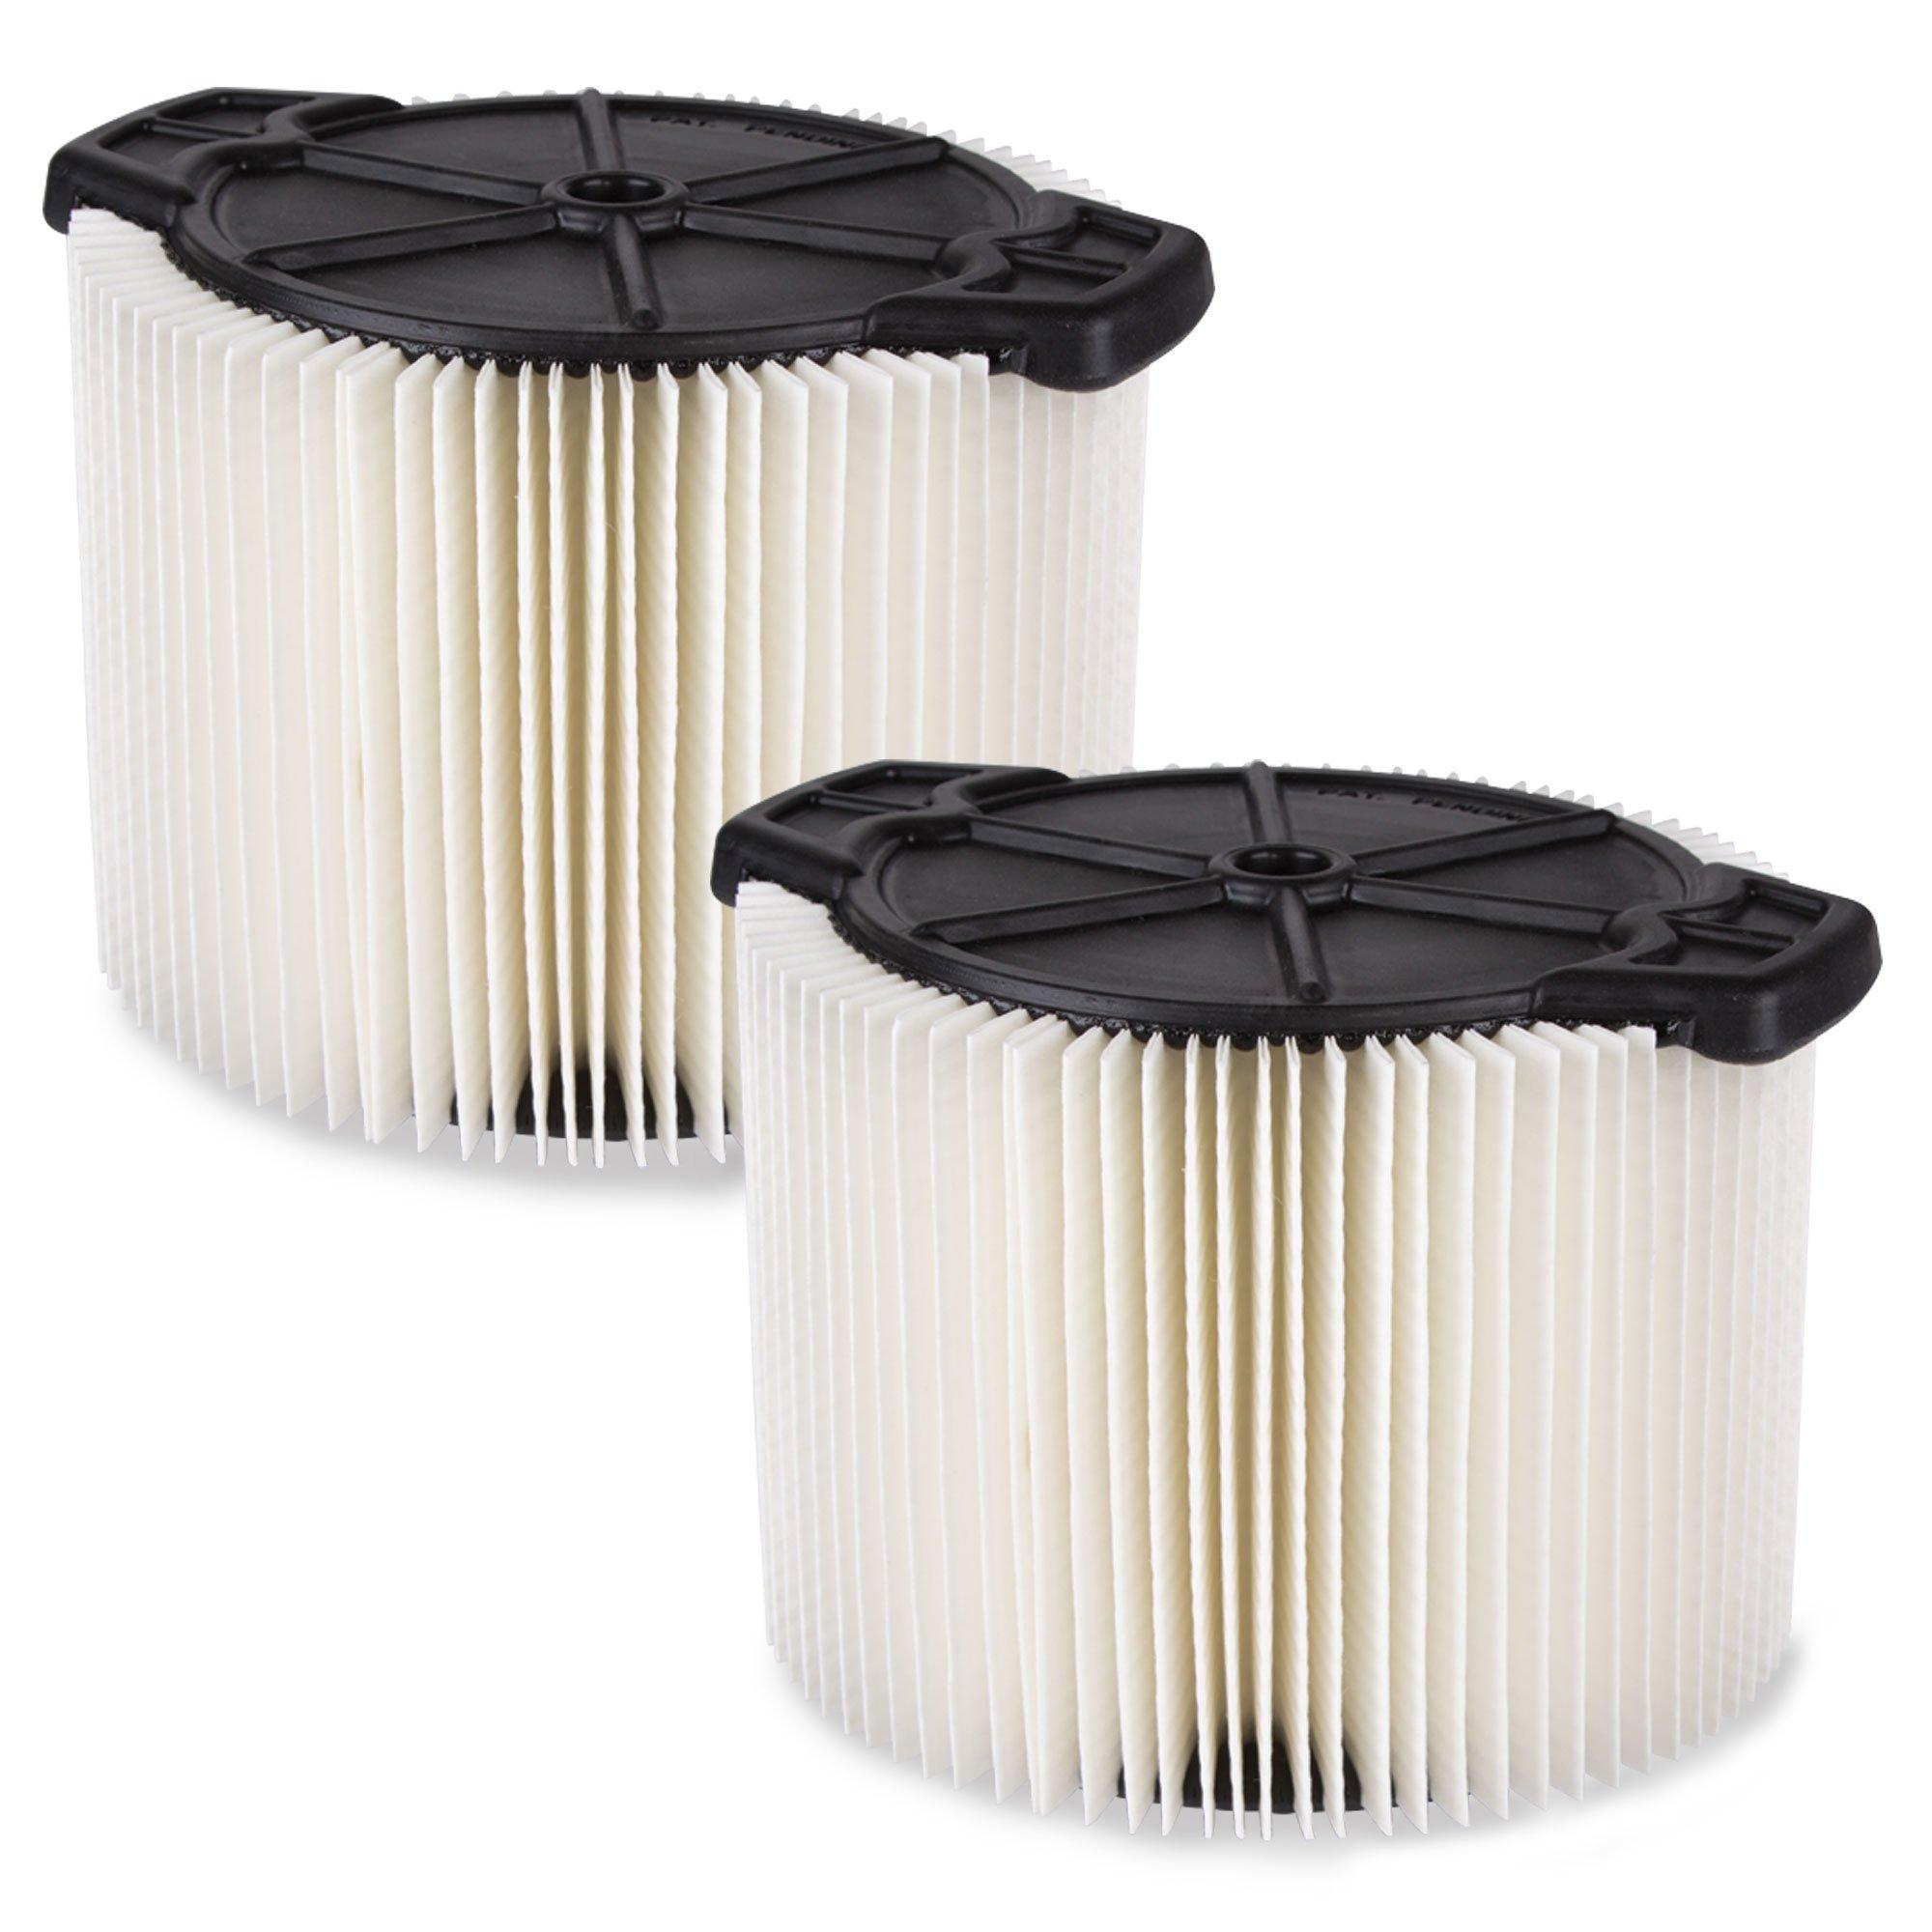 WORKSHOP Wet Dry Vac Filters WS11045F2 Standard Wet Dry Vacuum Filters (2-Pack - Shop Vacuum Filters) For WORKSHOP 3-Gallon To 4-1/2-Gallon Shop Vacuum Cleaners by WORKSHOP Wet/Dry Vacs